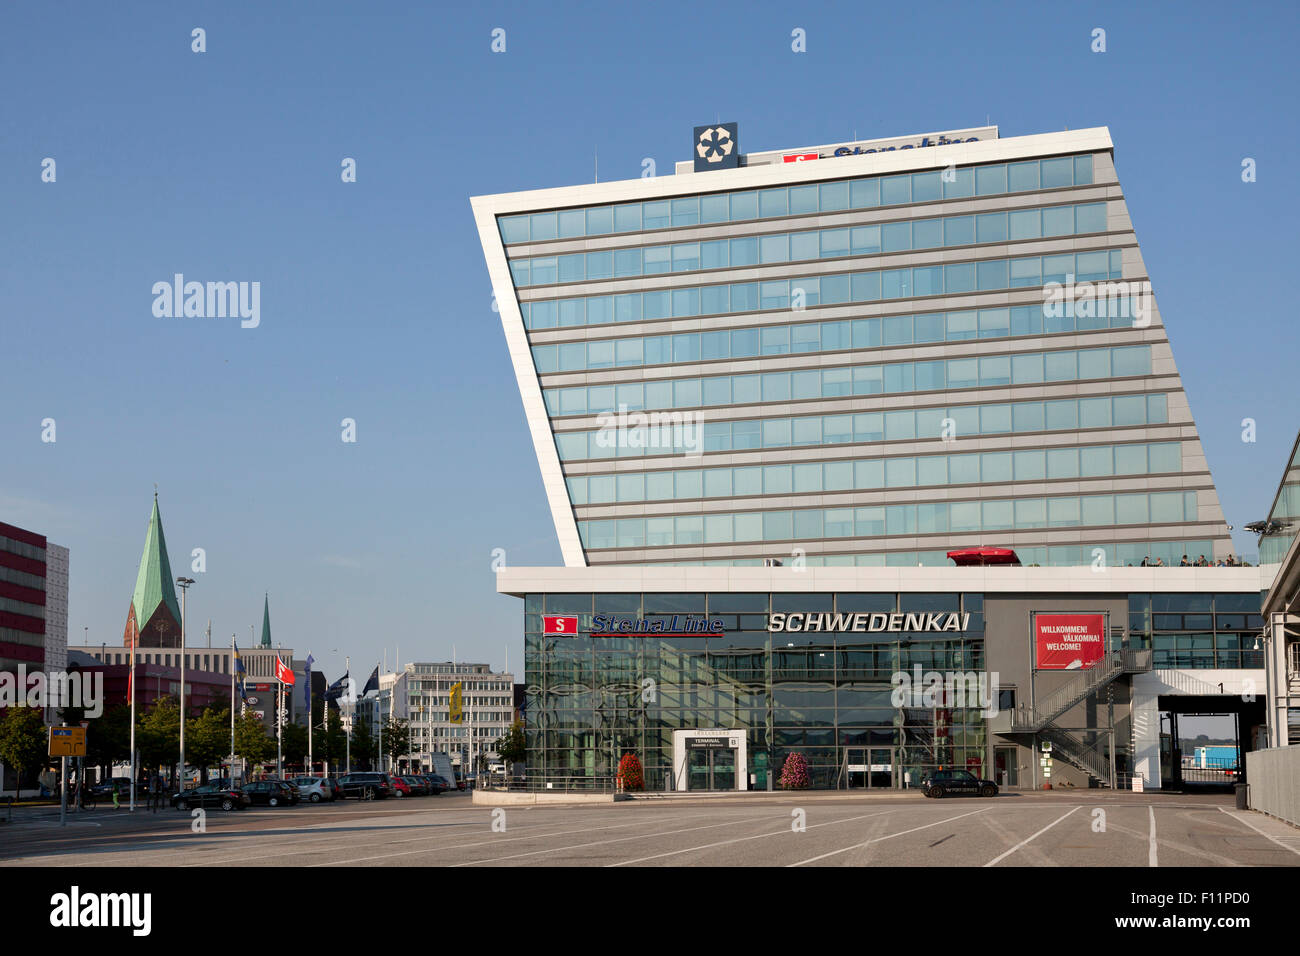 Stena Line building in Kiel, Schleswig-Holstein, Germany - Stock Image